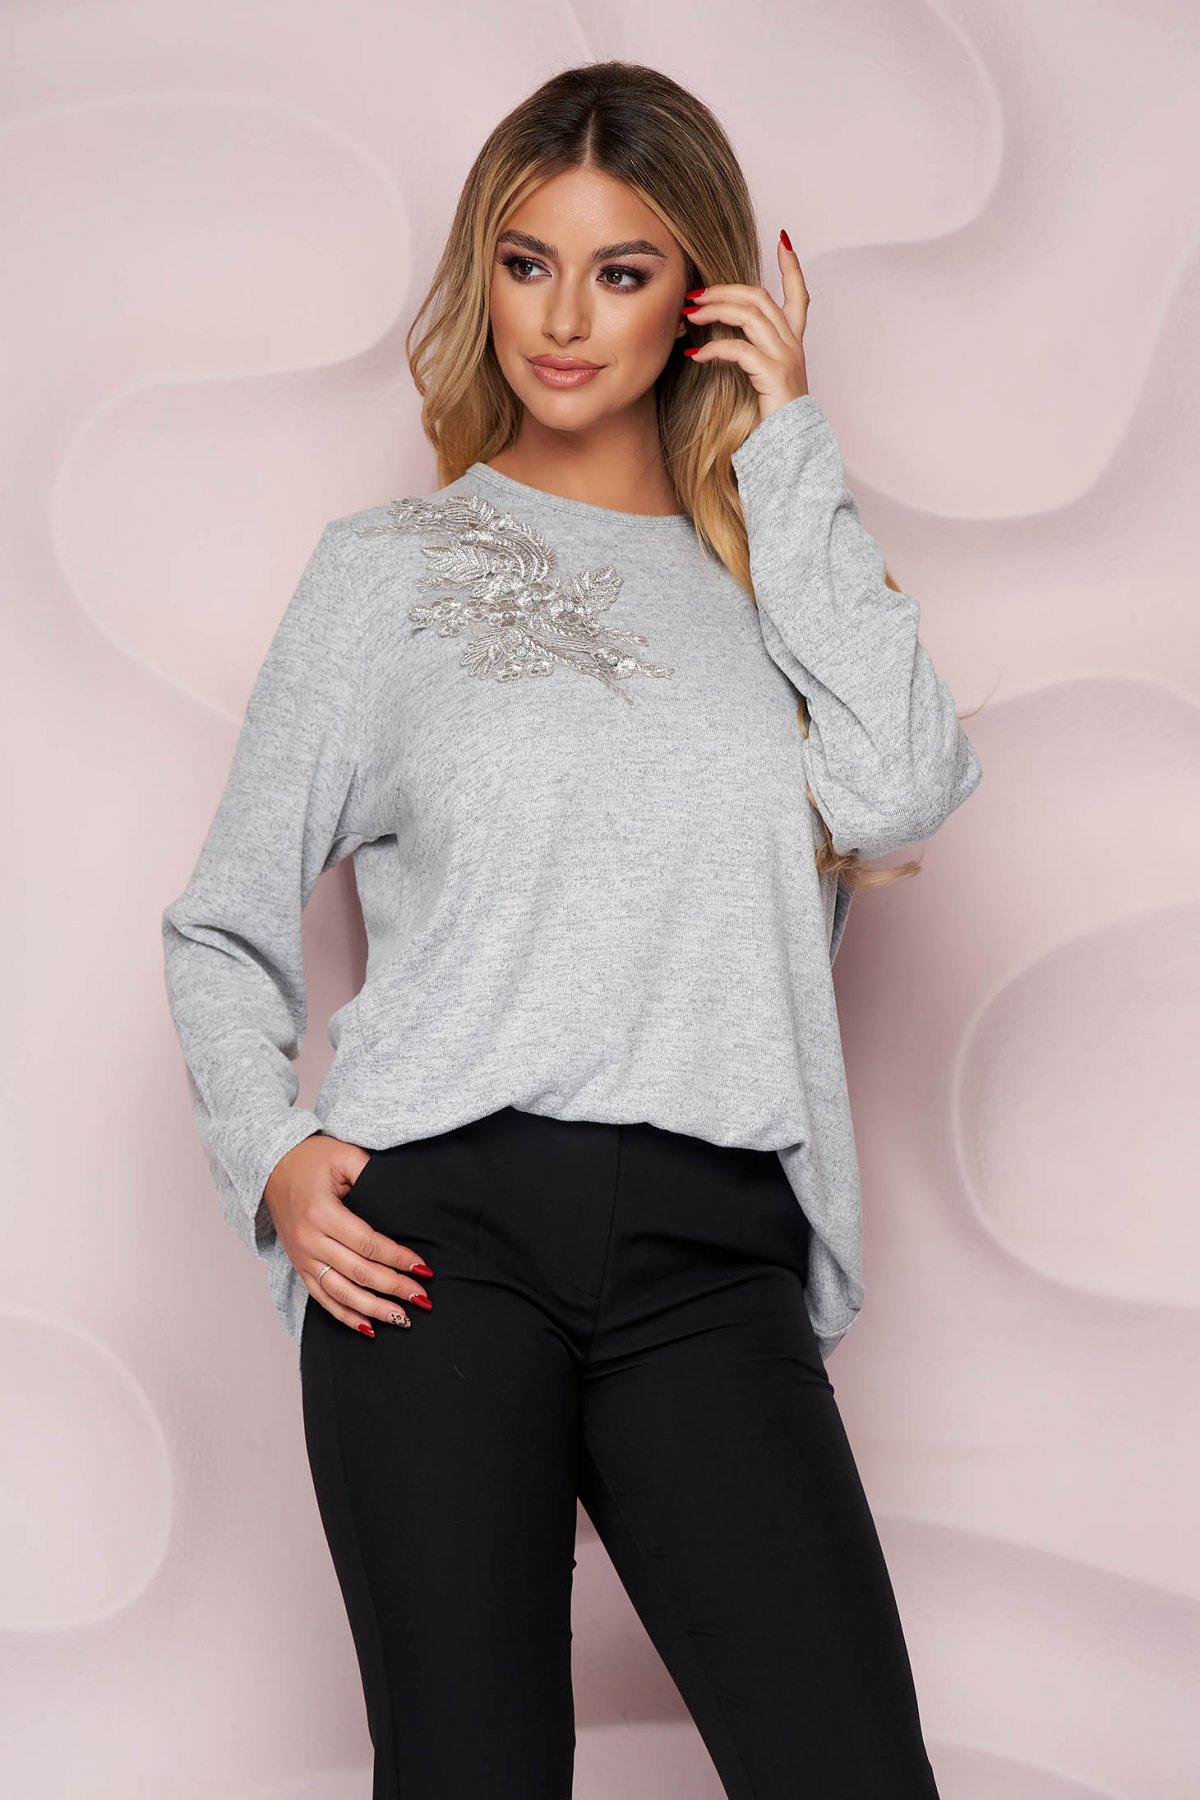 Bluza dama Lady Pandora gri office cu croi larg din material tricotat elastic si subtire si broderie florala